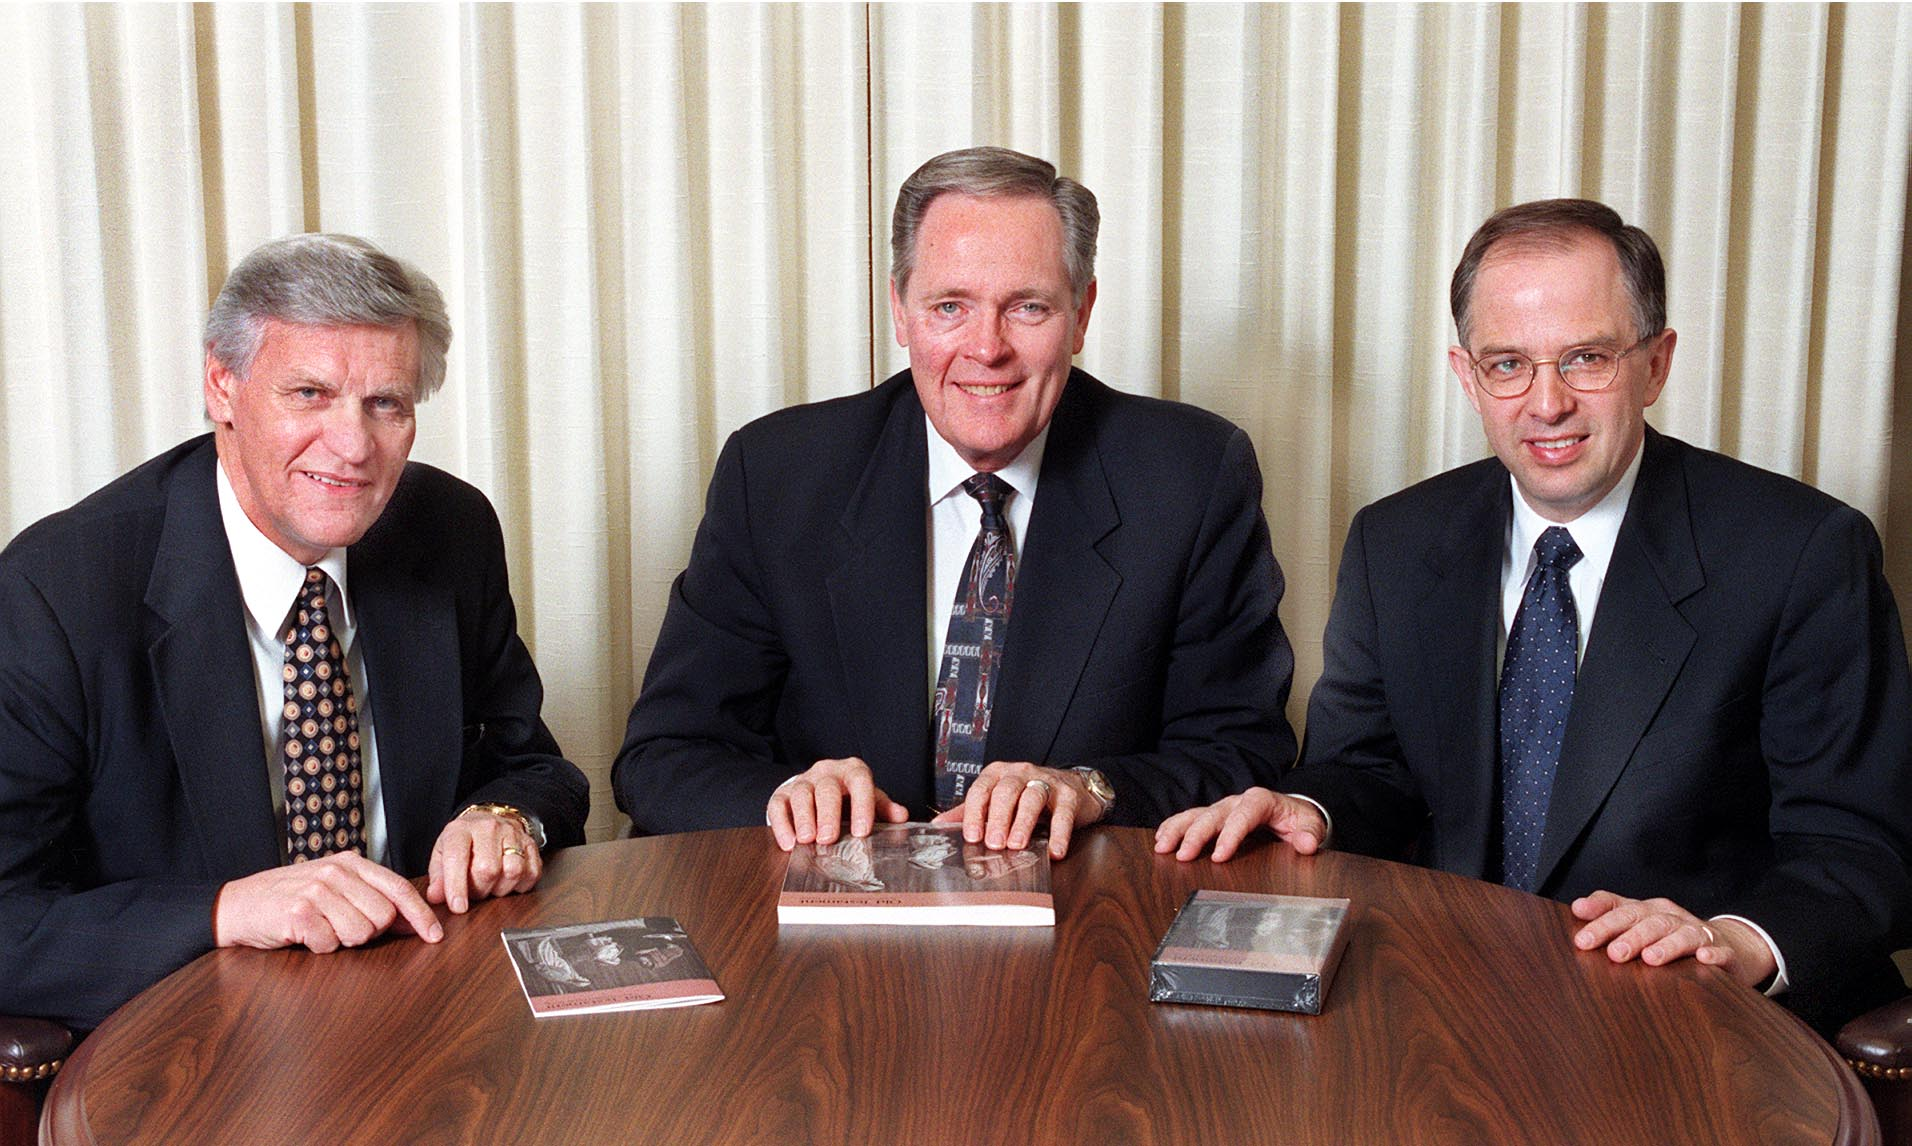 Sunday School general presidency. (l to r) Elder Glenn Pace, first counselor, Elder Harold G. Hillam, president, and Elder Neil L. Andersen, second counselor.